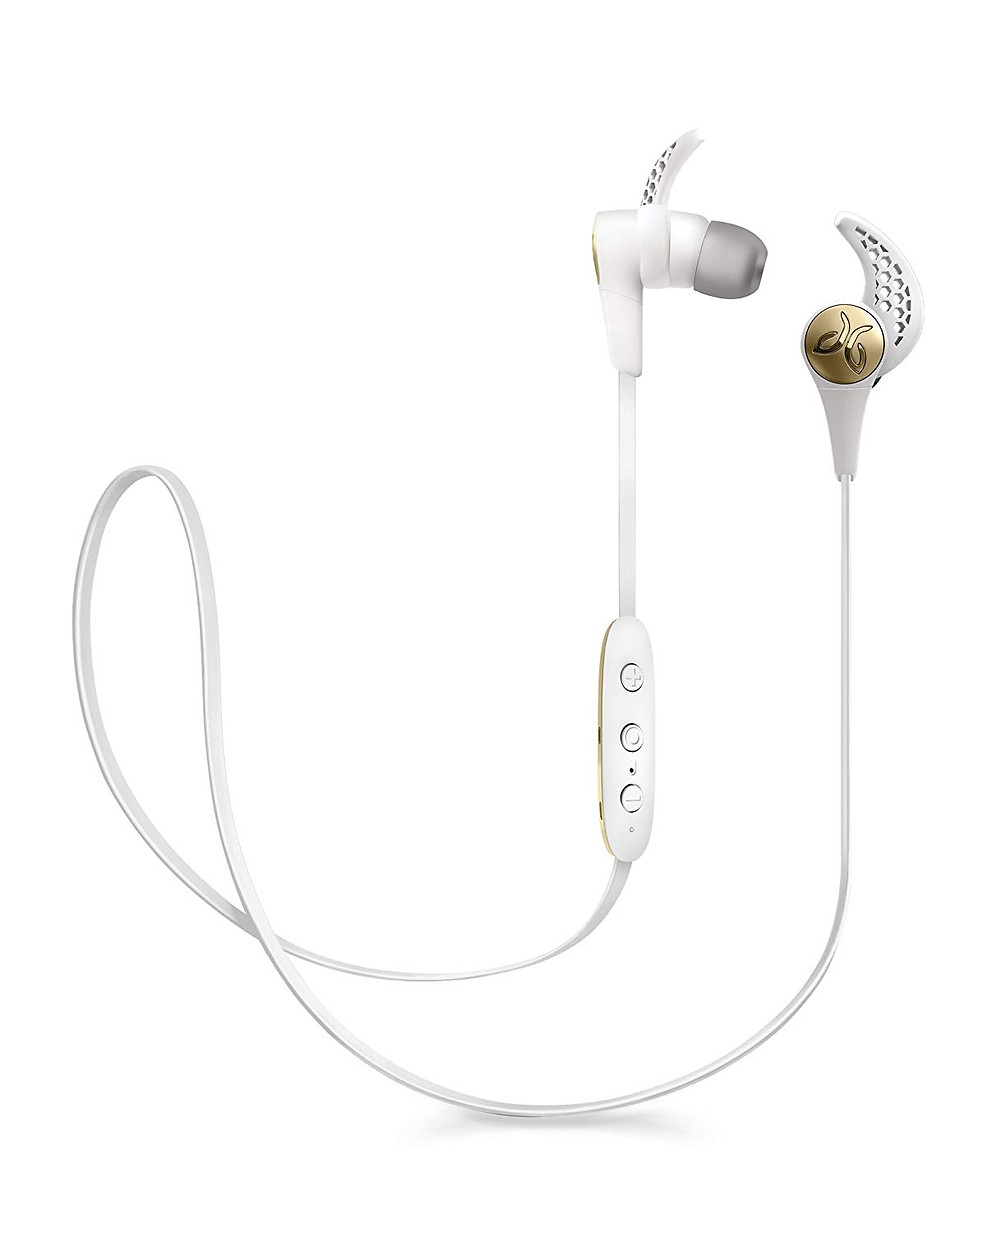 jaybird x3 bluetooth headphones wireless white and gold